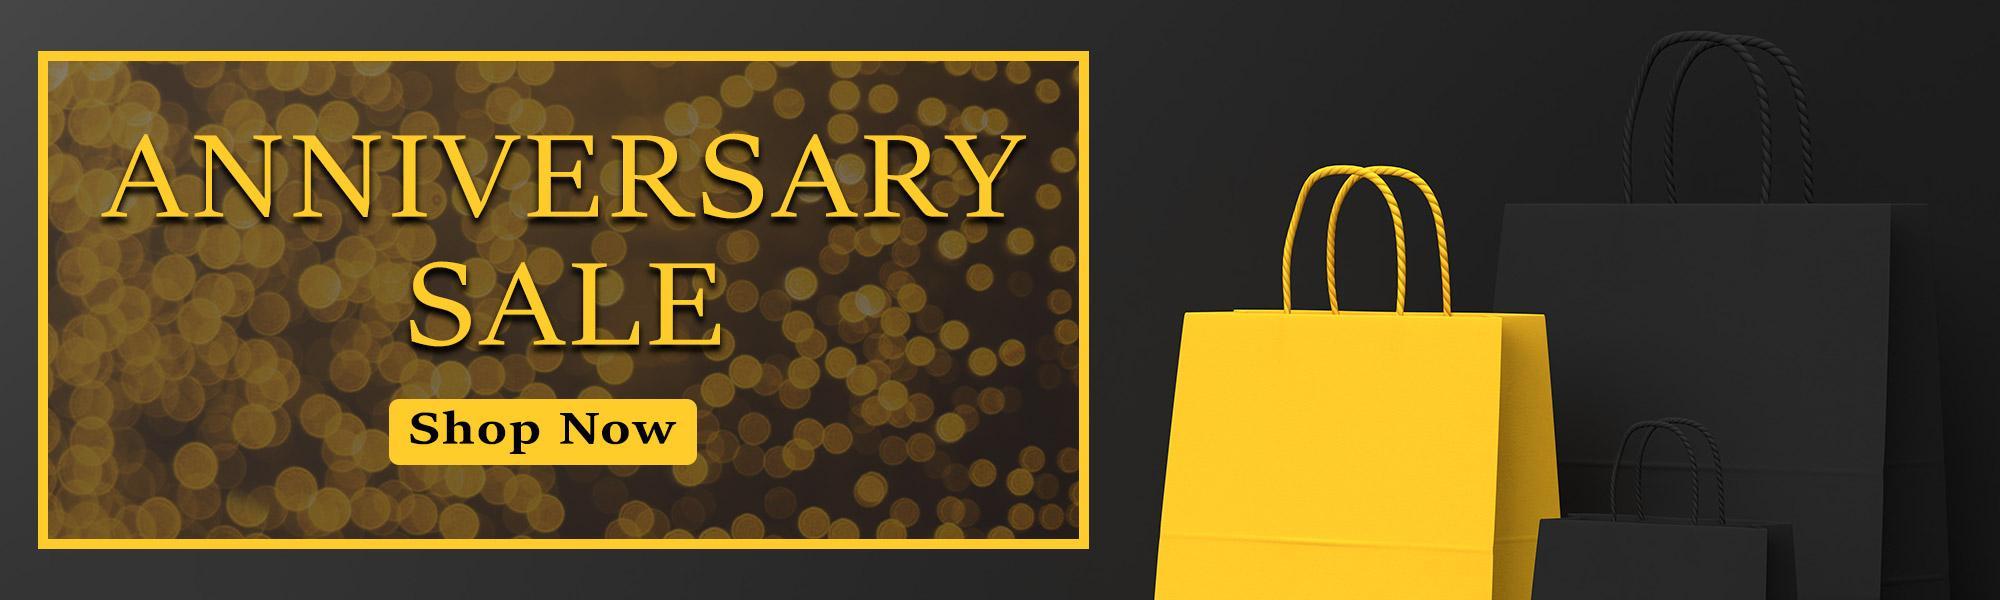 Anniversary Sale - Shop Now